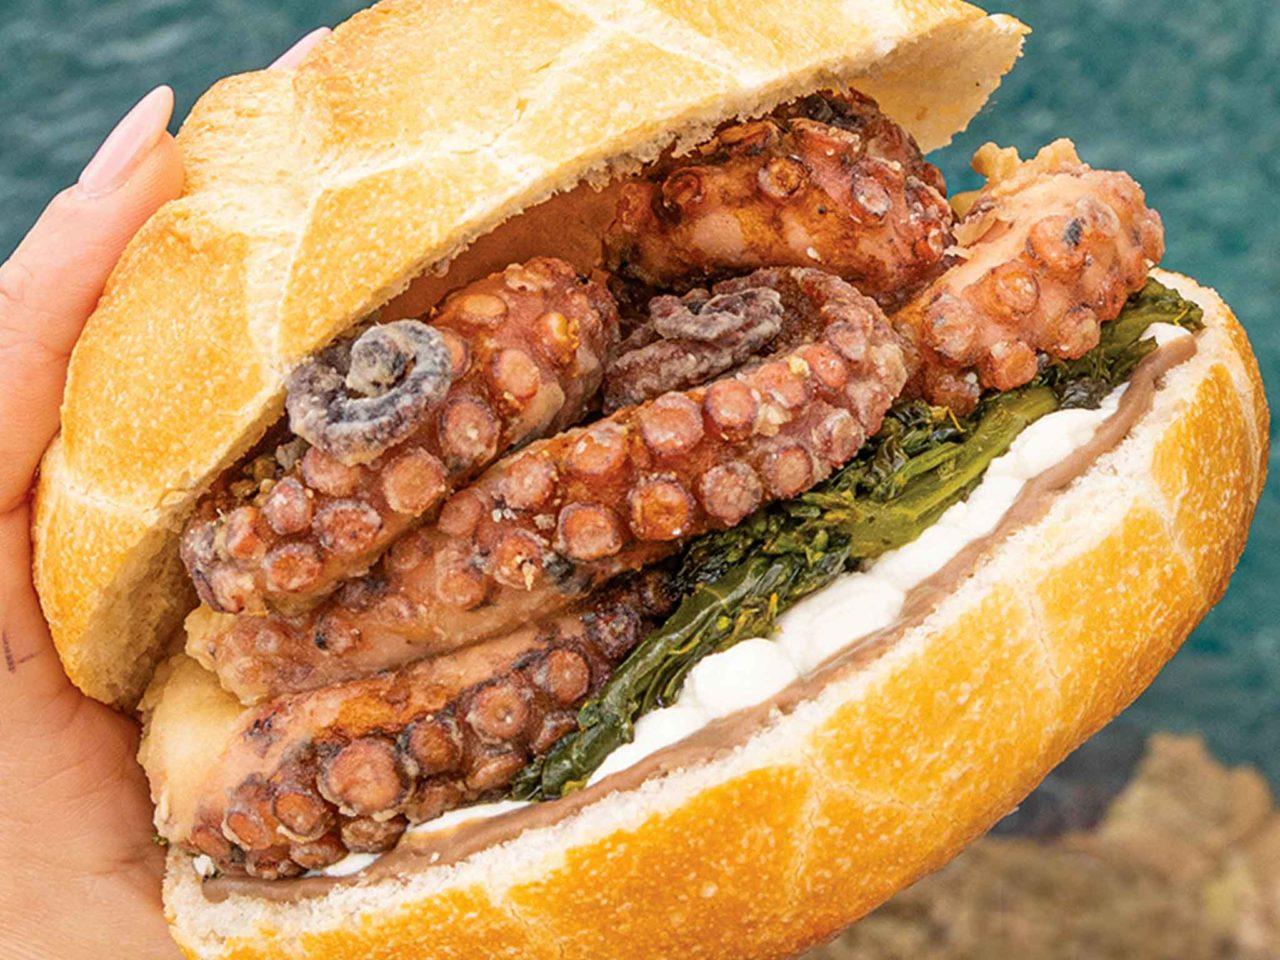 Pescaria panino con polpo arrosto